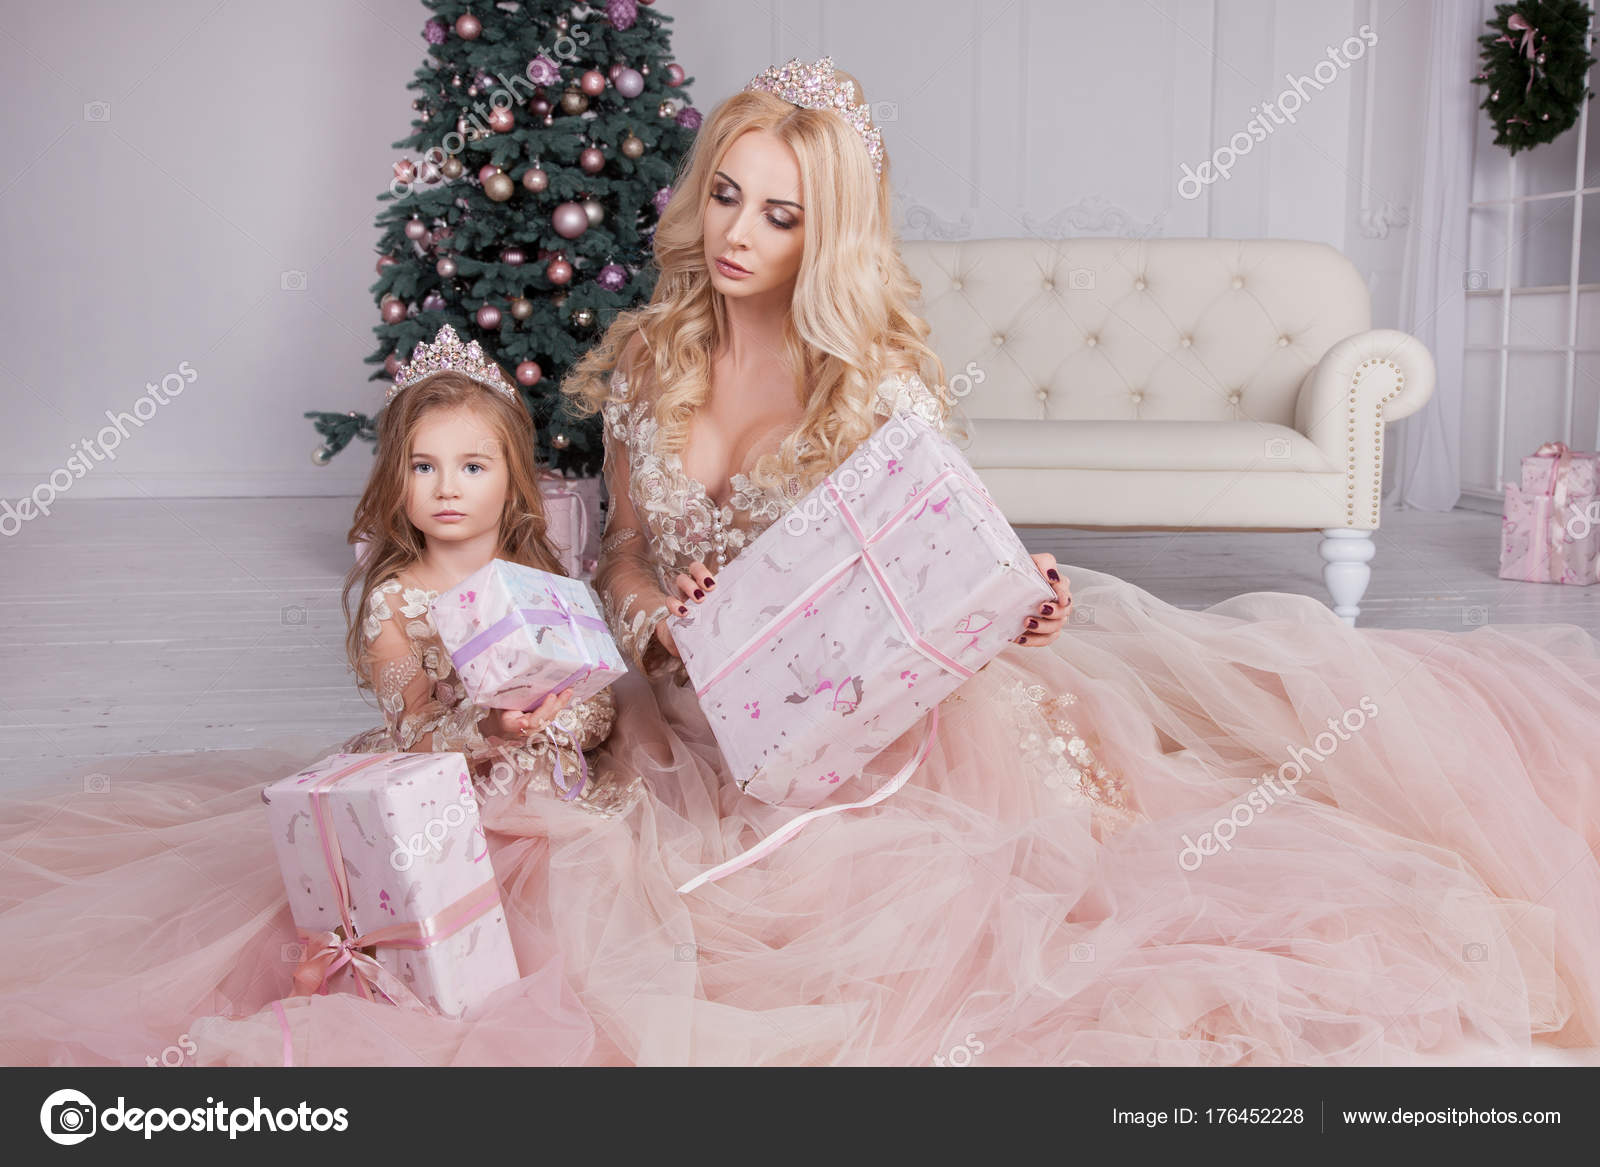 ff3fec258b49 Μαμά Και Κόρη Φοράει Ροζ Φορέματα Κρατώντας Δώρα Χριστουγέννων Μαμά — Φωτογραφία  Αρχείου